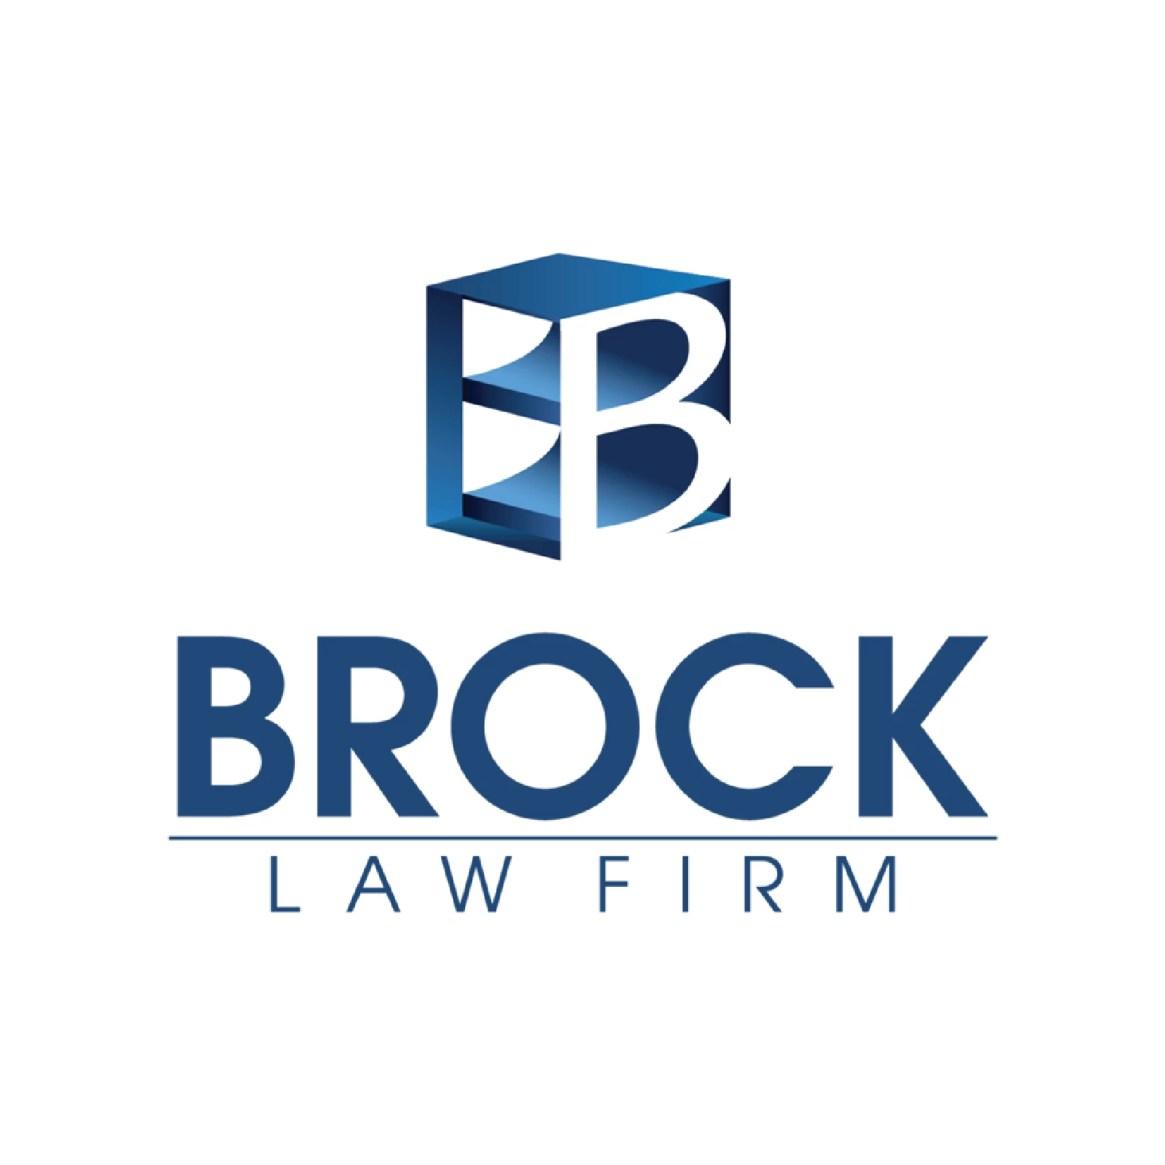 Brock Law Firm Logo